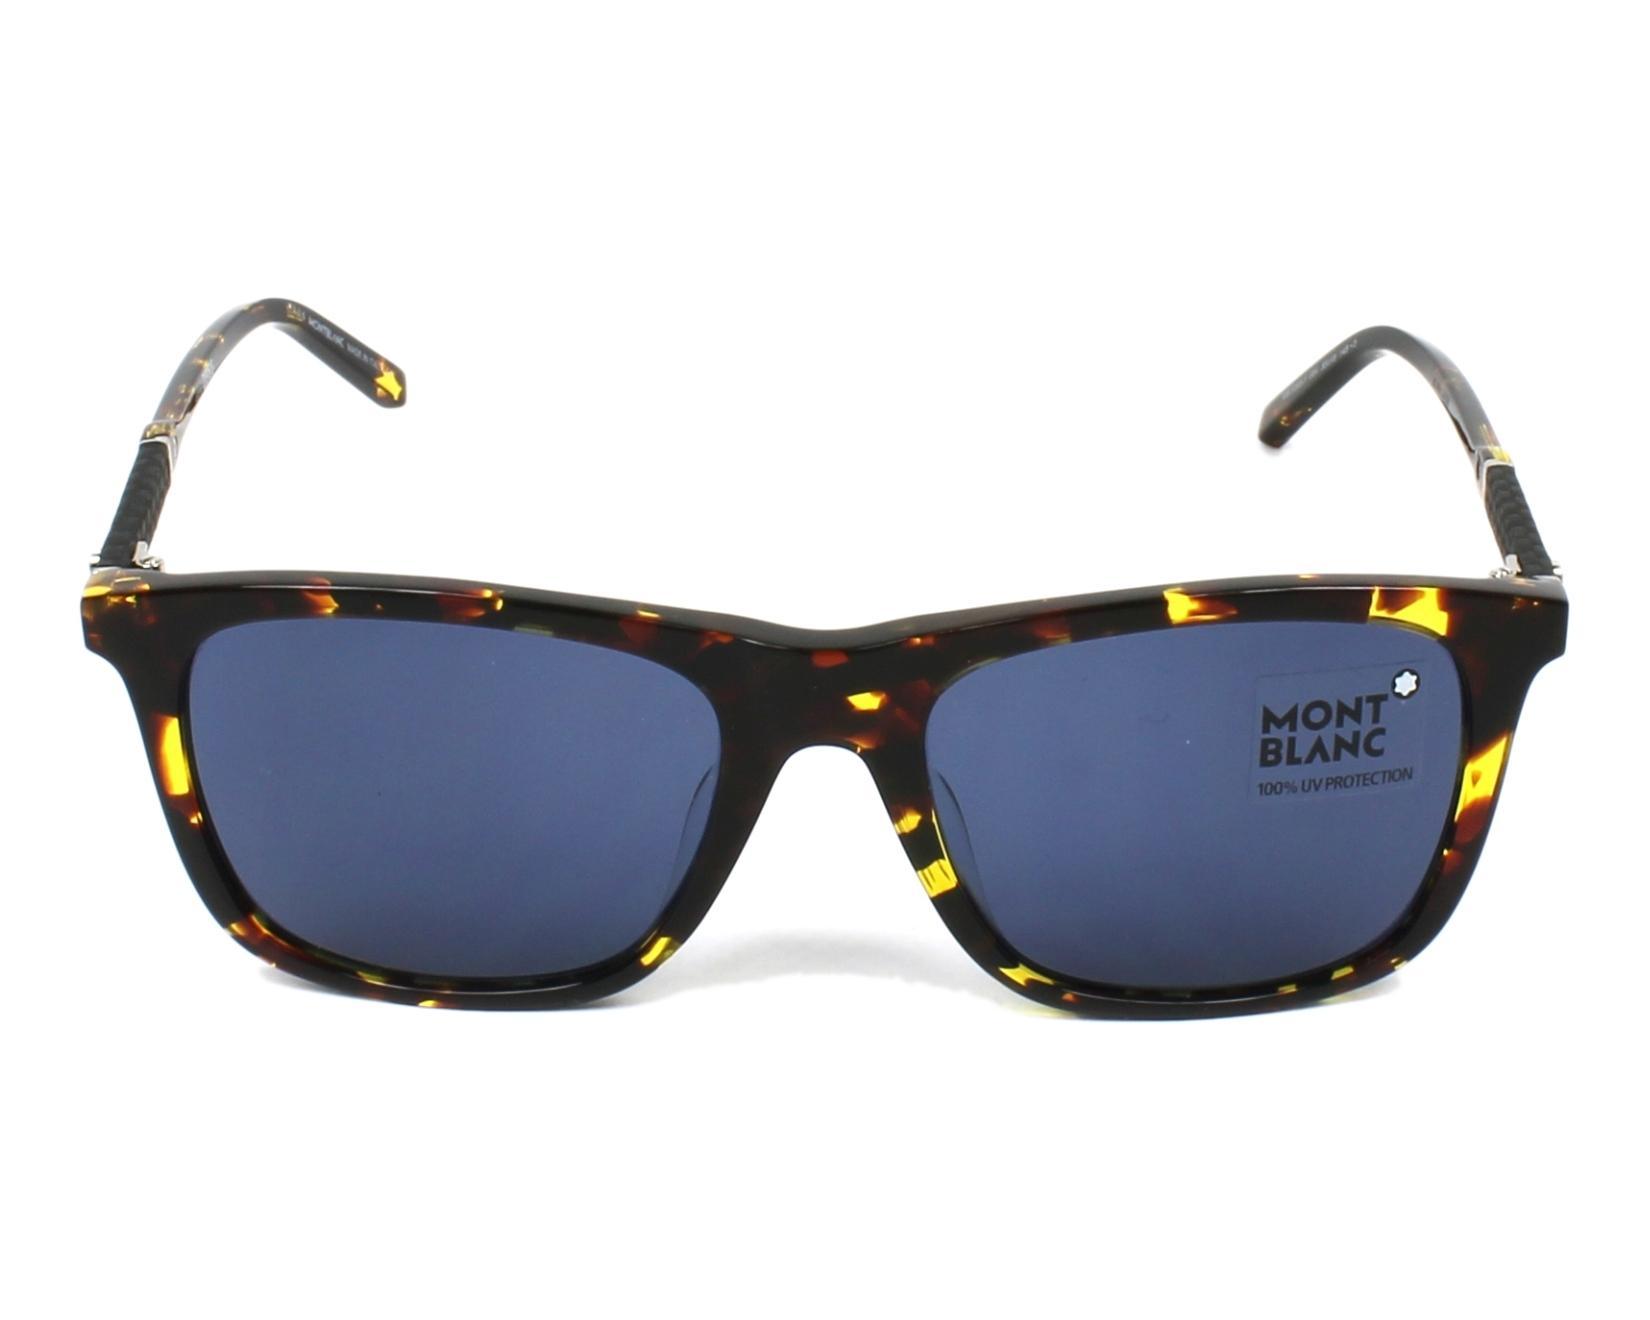 lunettes de soleil mont blanc mb 606 s f 55v havane avec des verres bleu gris. Black Bedroom Furniture Sets. Home Design Ideas